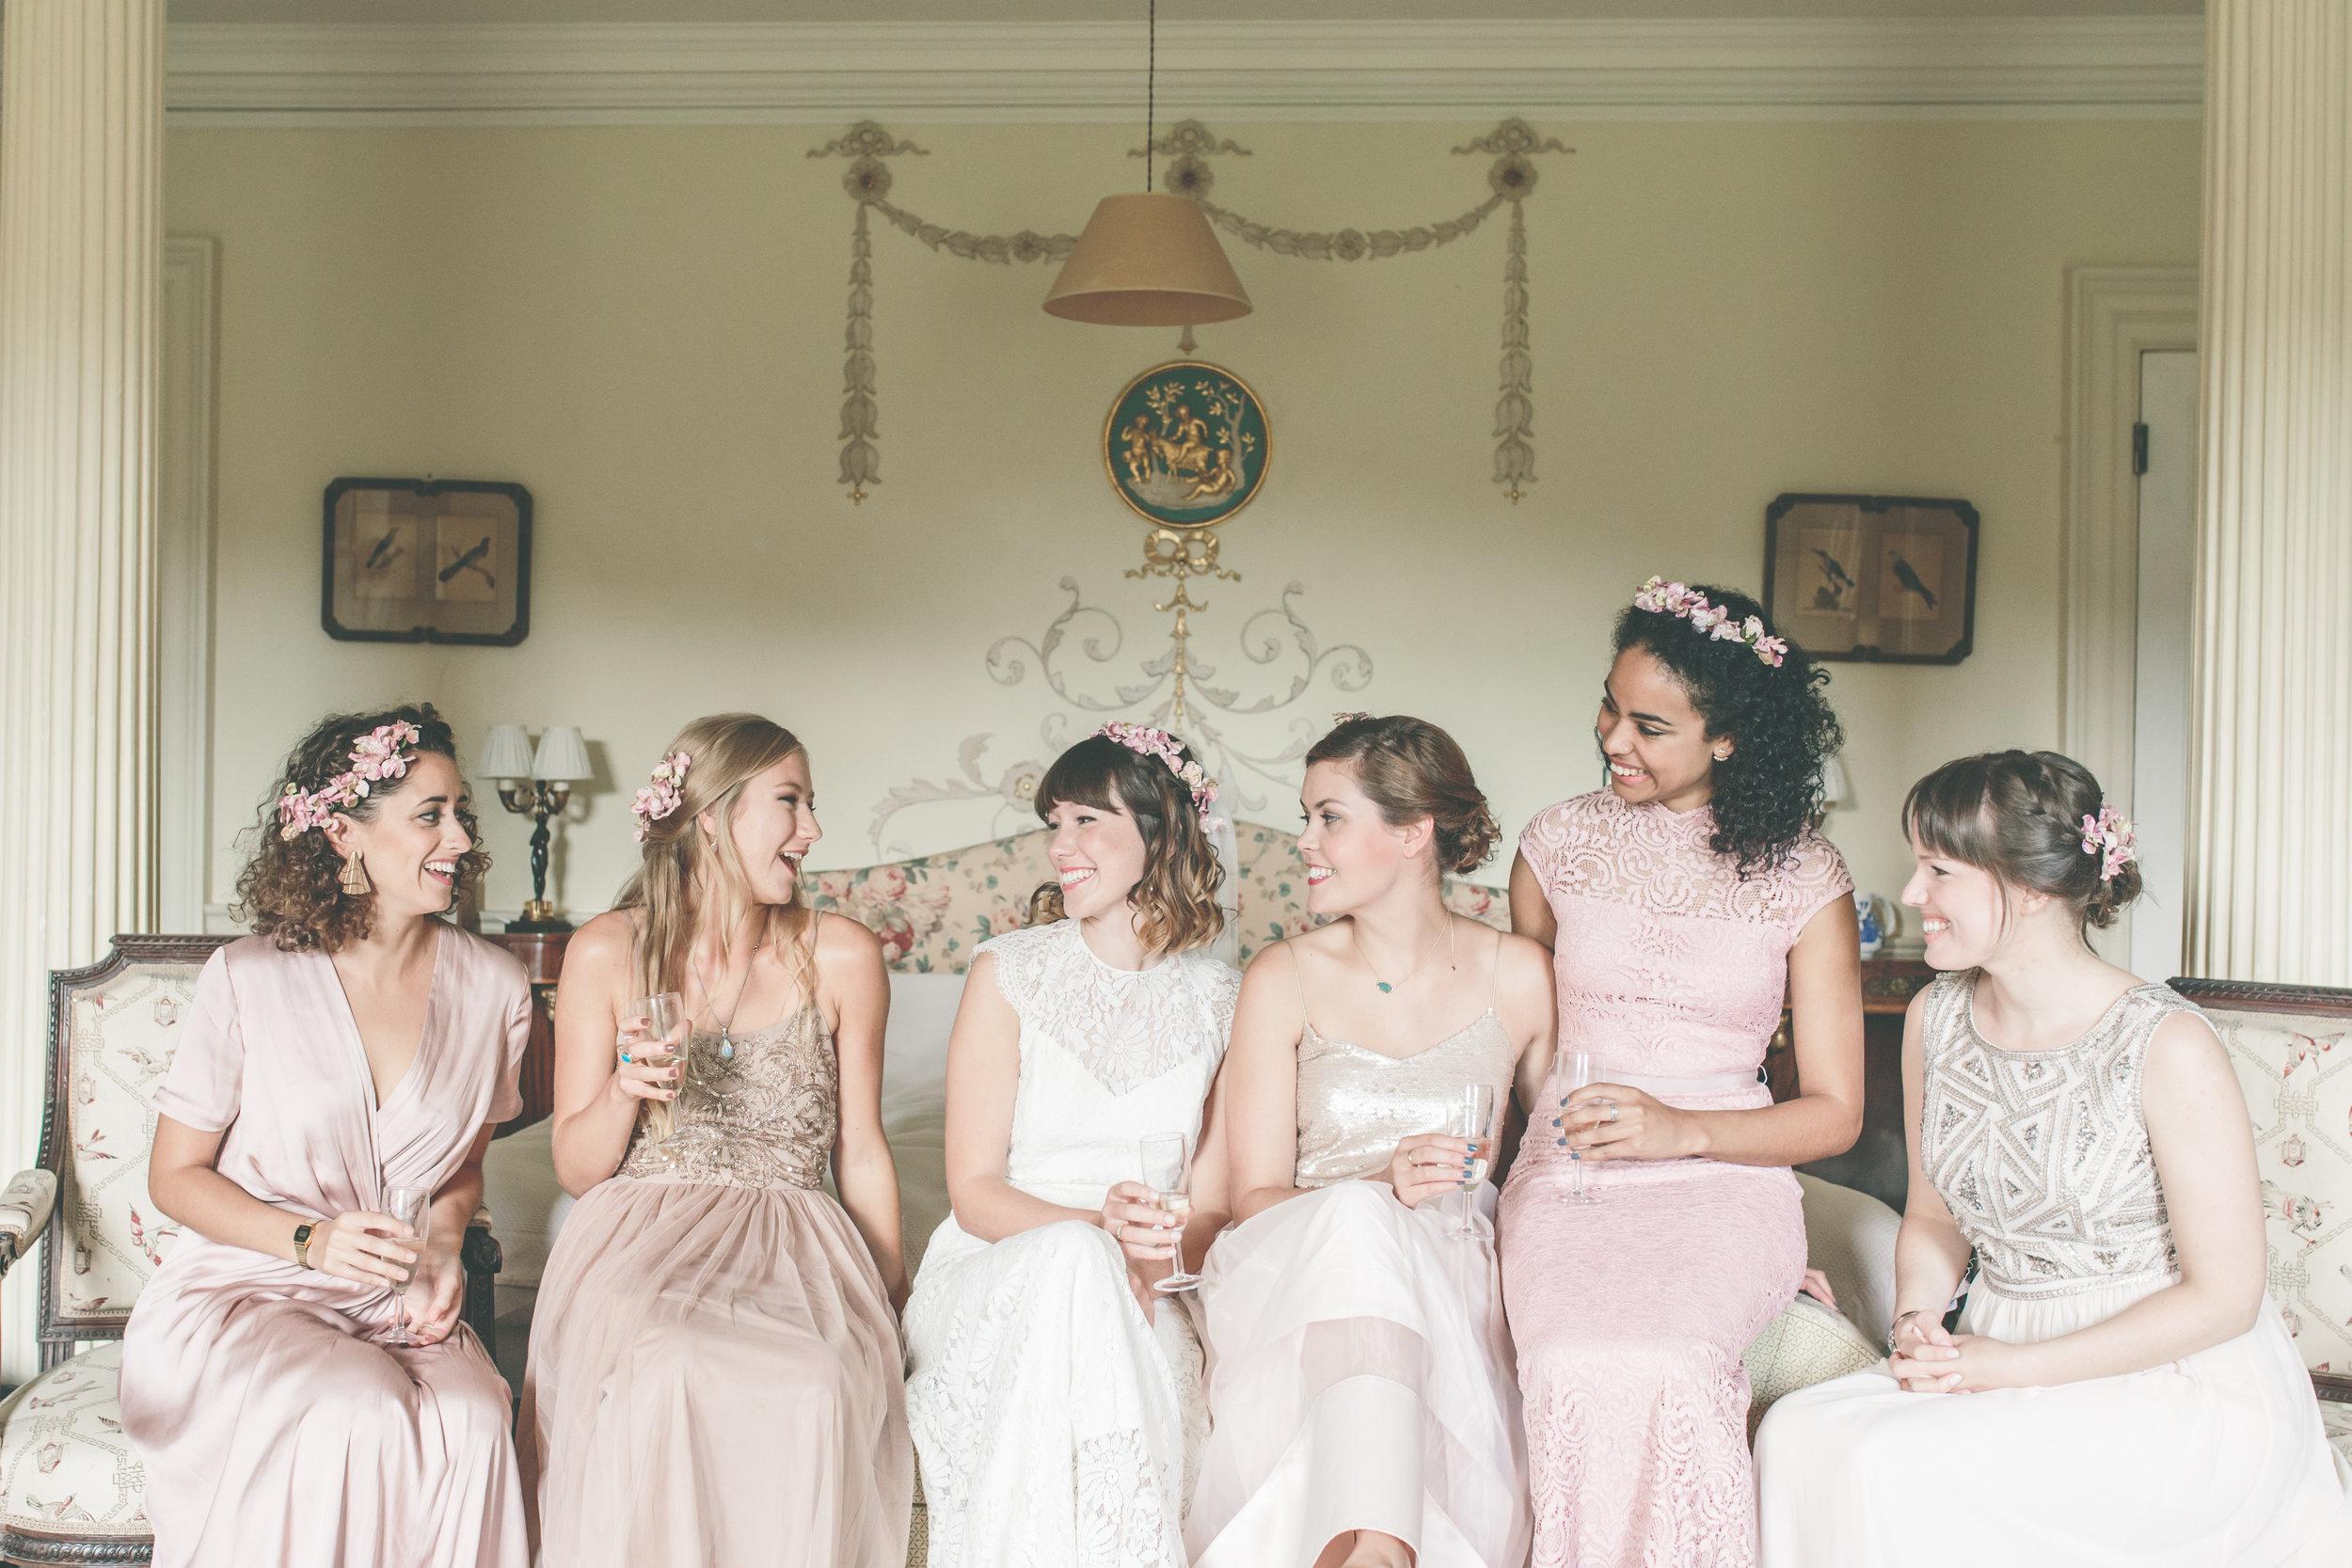 Walcot Hall Wedding - Natural Wedding Photography